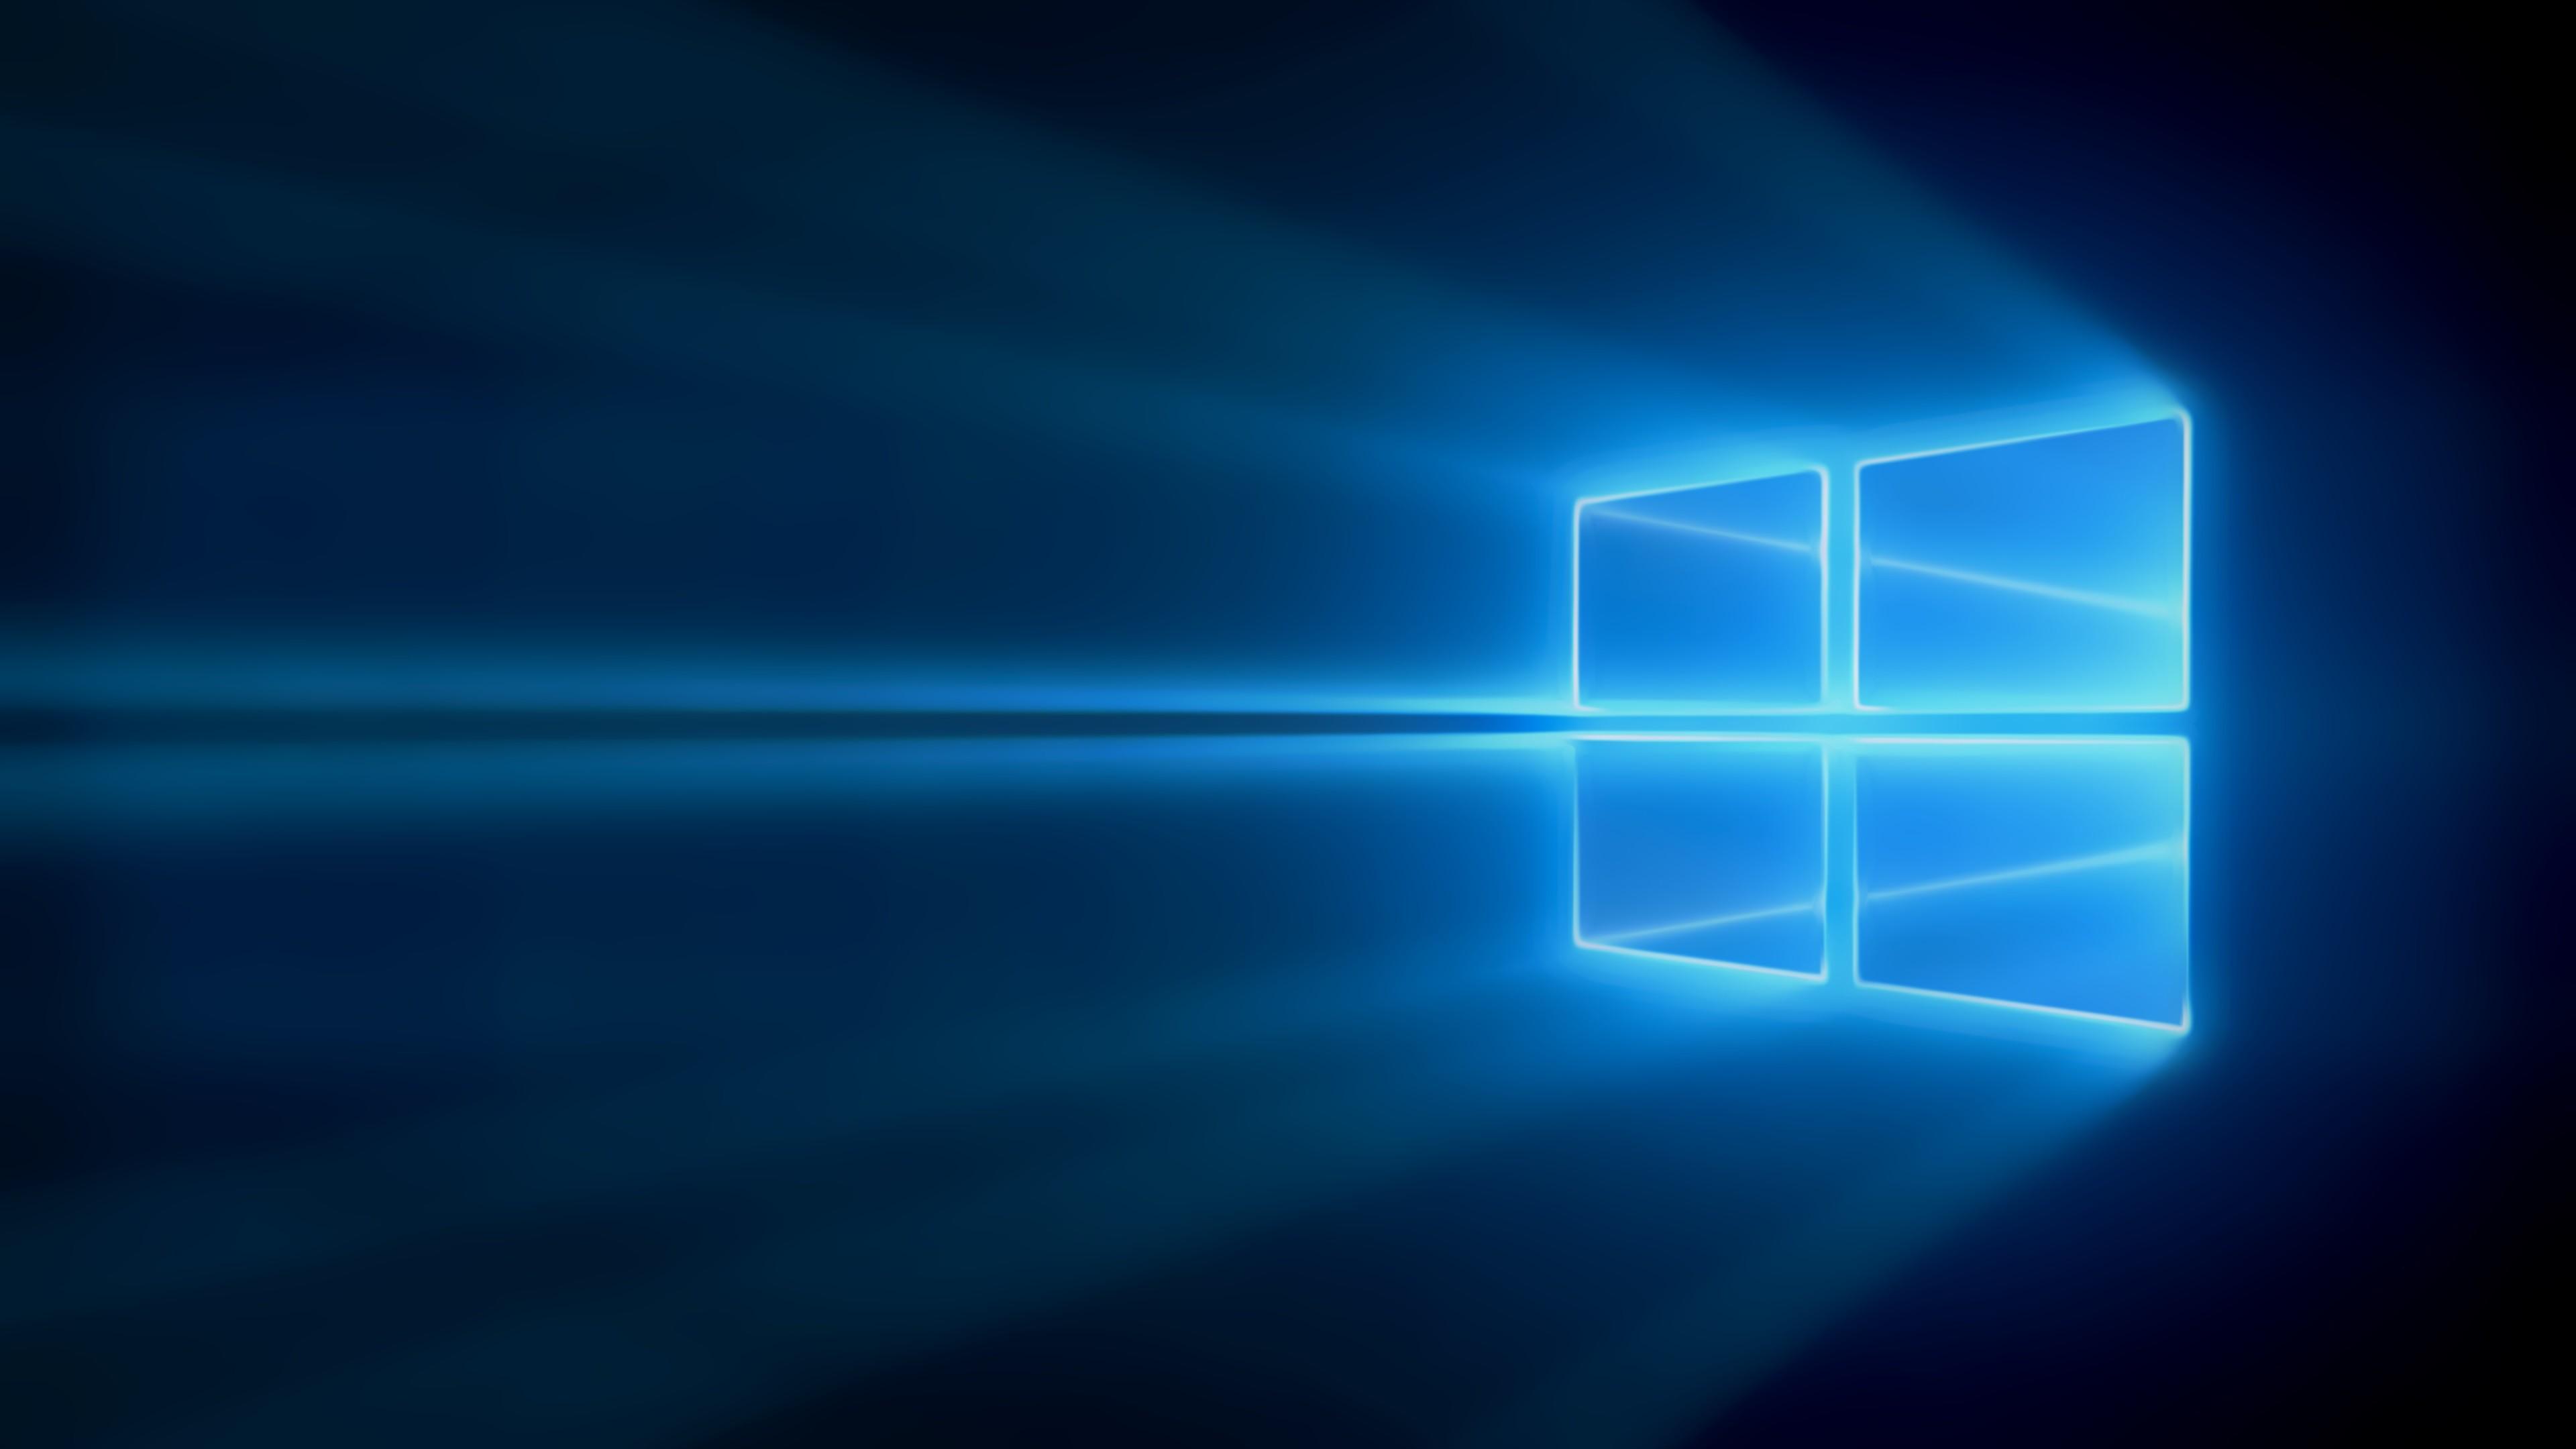 Windows 10 wallpaper - Windows 10 Hd Wallpapers